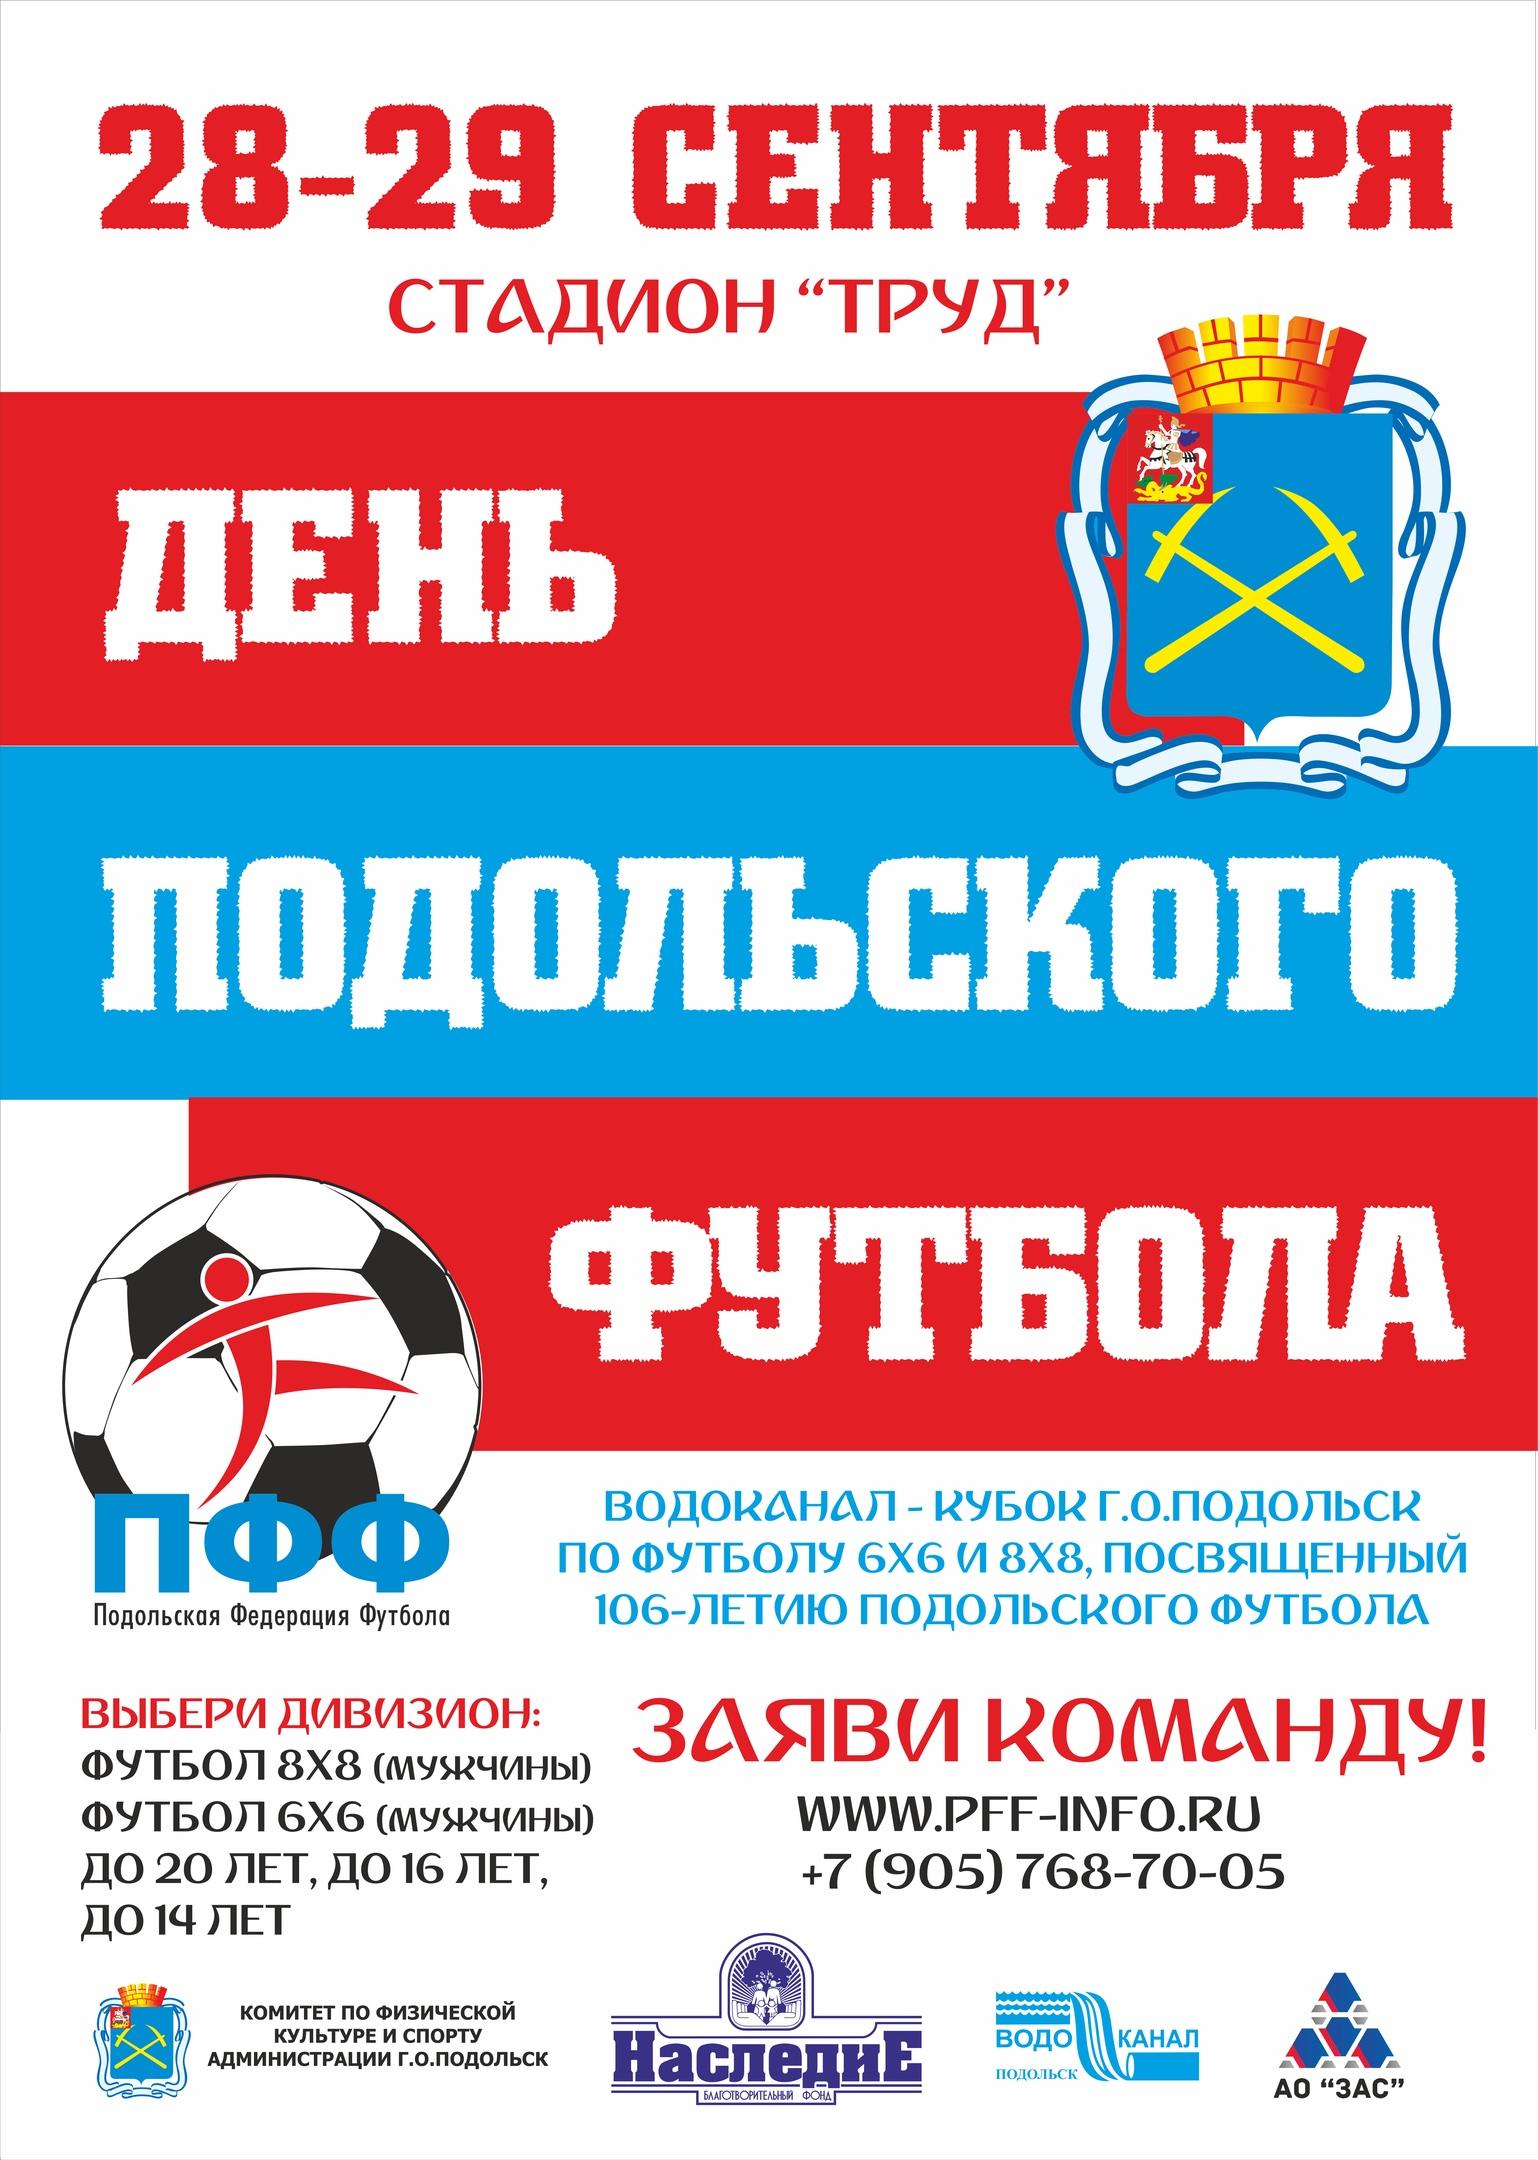 Водоканал – Кубок Подольска по футболу 6Х6, 8Х8 (28-29 сентября) – подать заявку